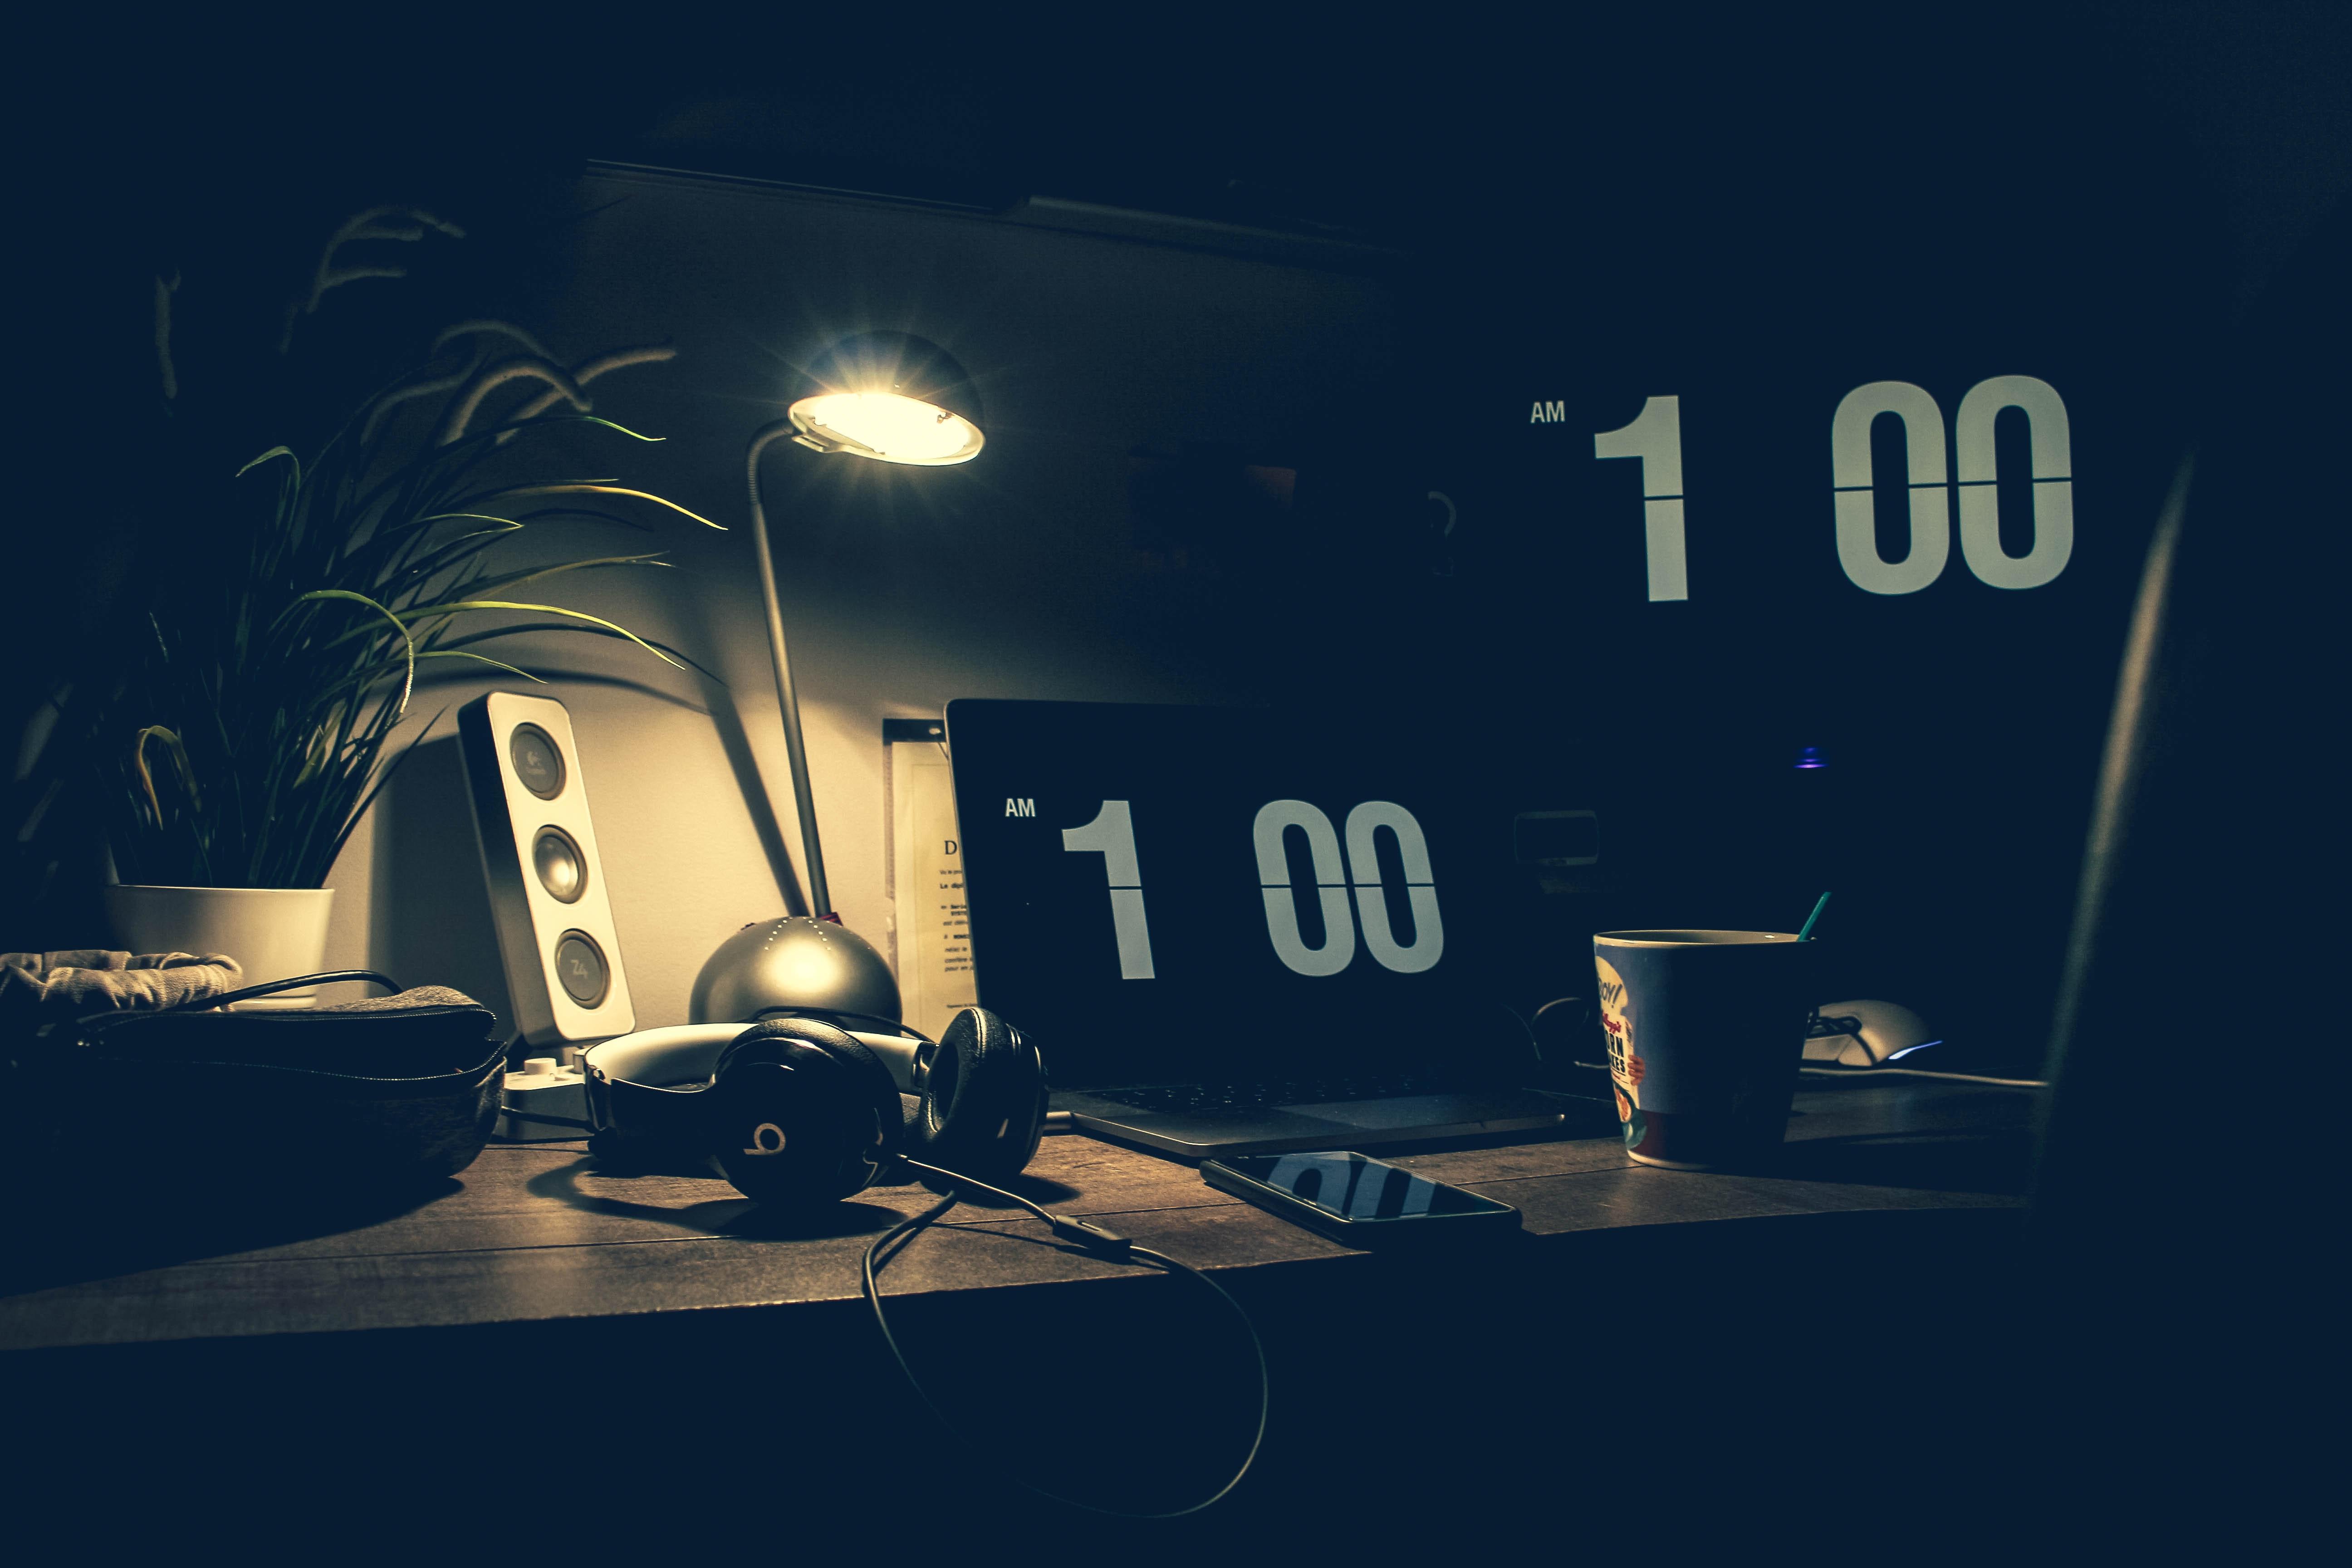 Black Digital Alarm Clock at 1:00, Alarm, Macbook, Time, Technology, HQ Photo